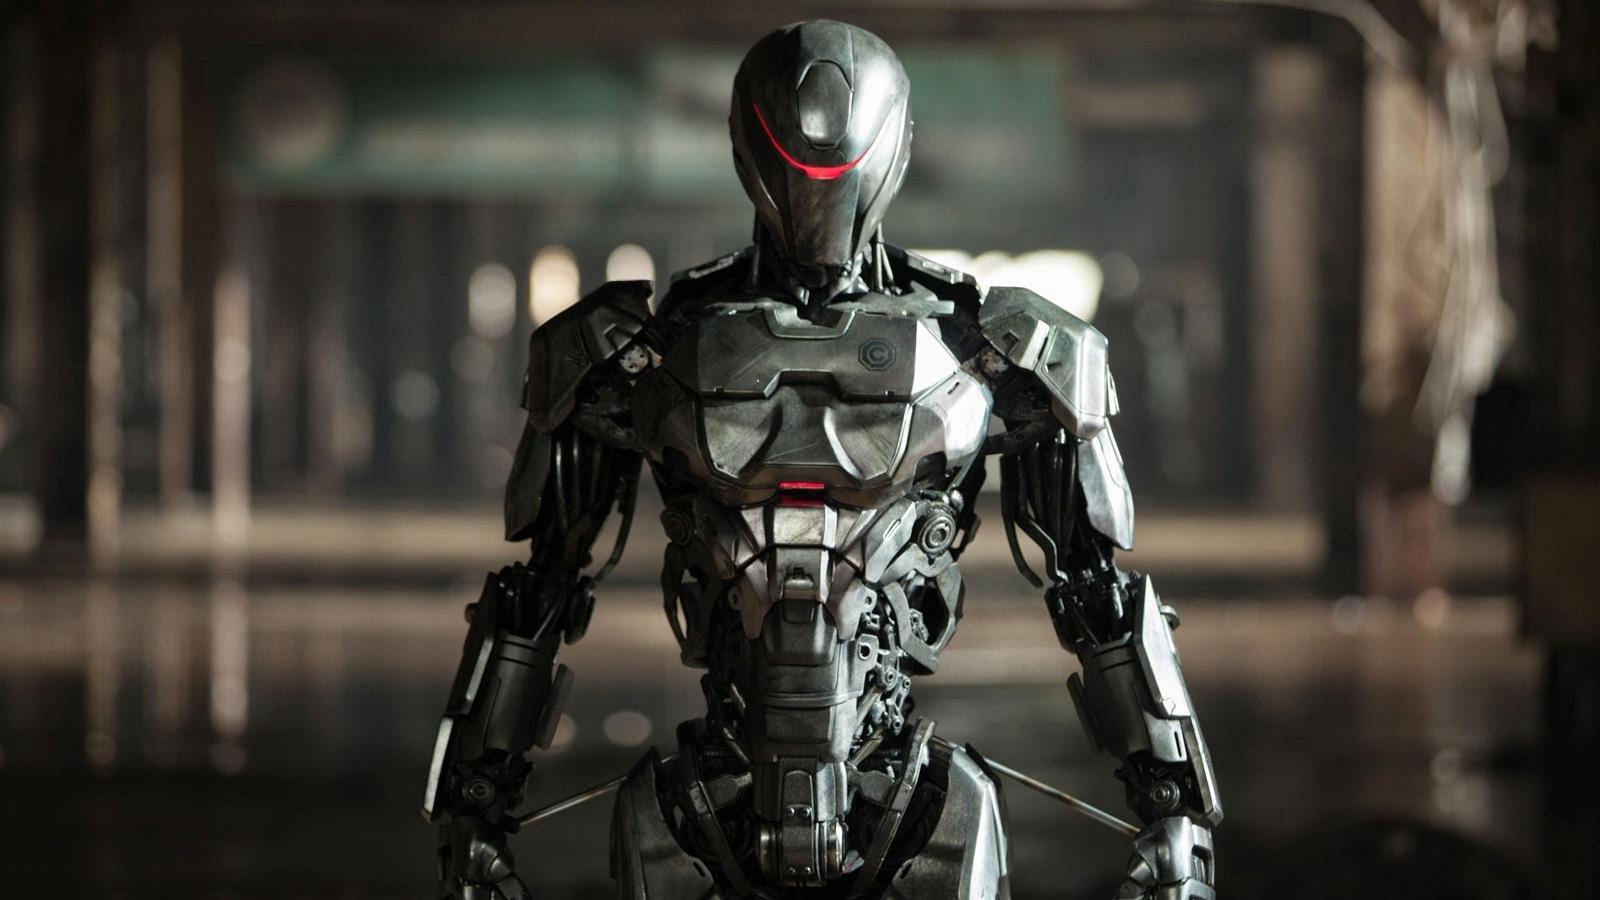 High Resolution Robocop 2014 Hd 1600x900 Wallpaper ID497759 For PC